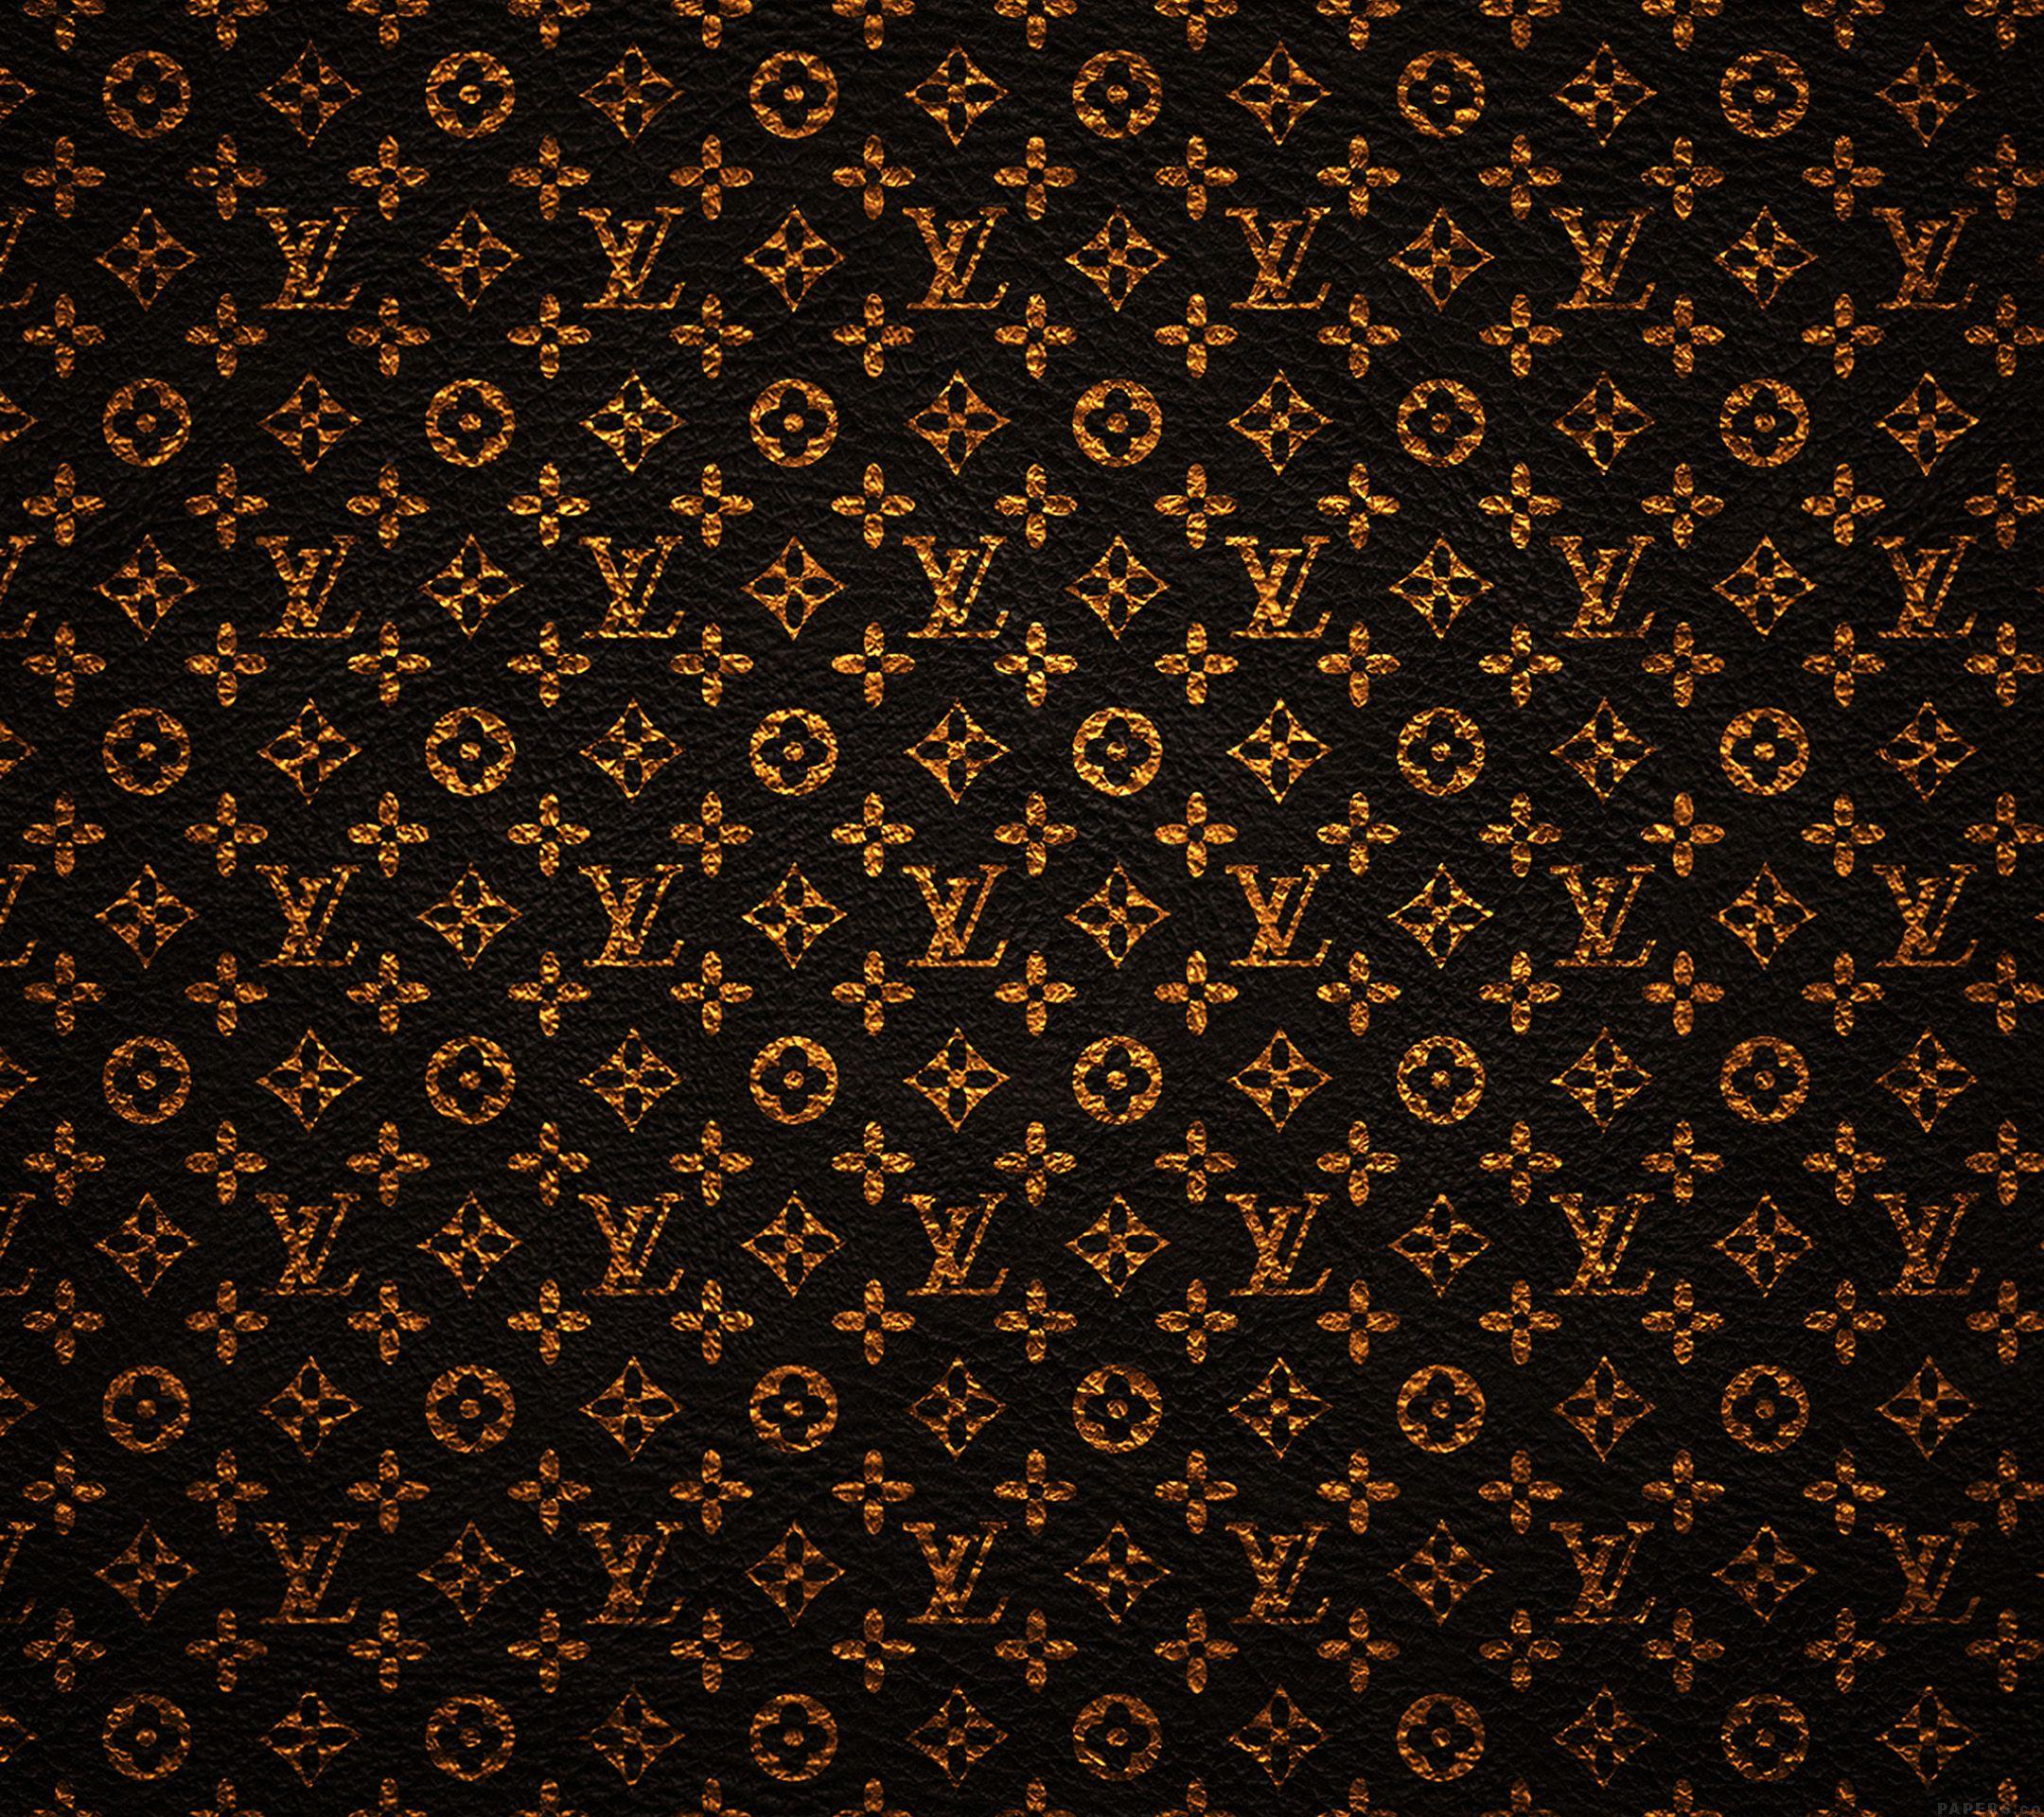 Louis_Vuitton LV Vuitton background wallpaper